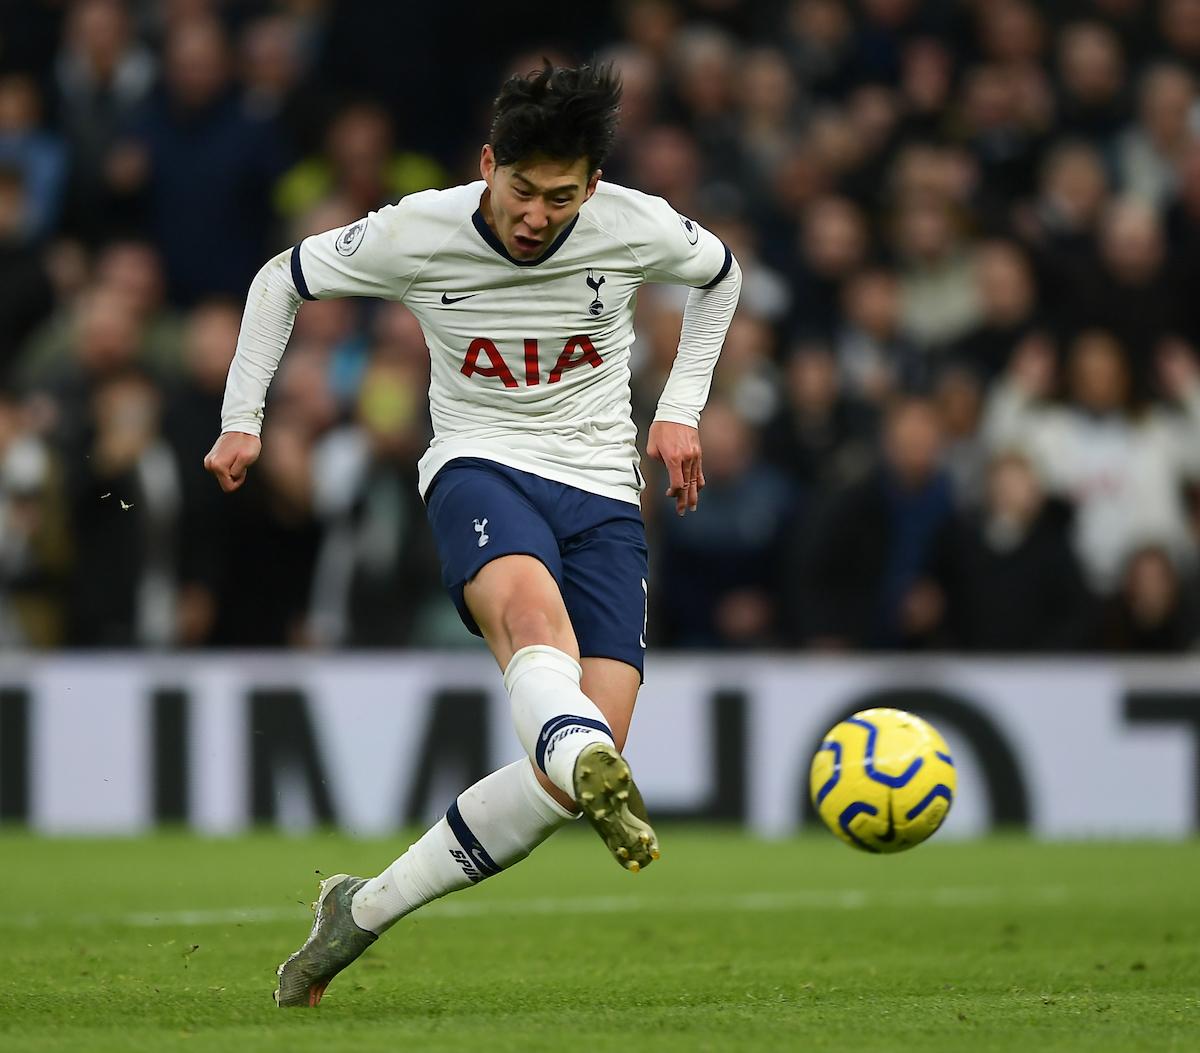 Son of Tottenham shoots